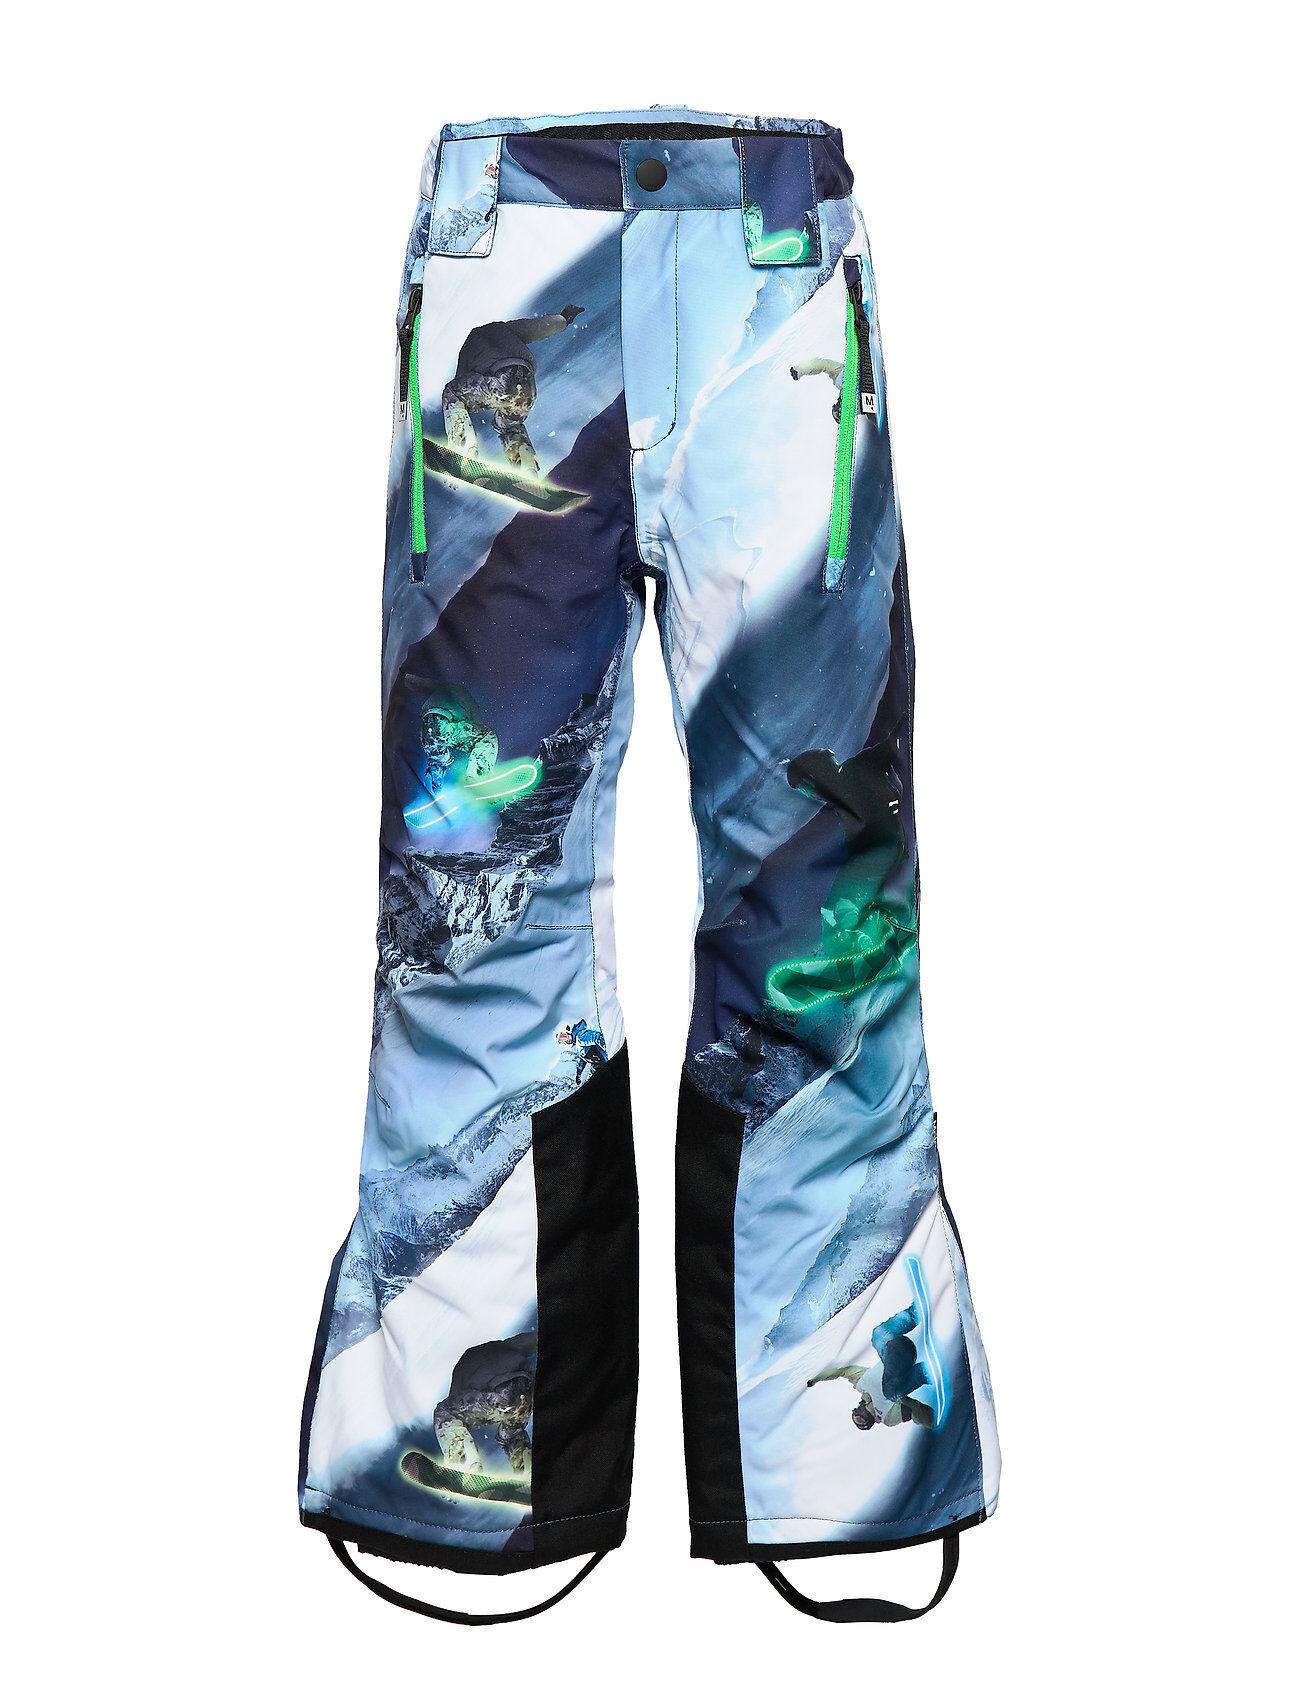 Molo Jump Pro Outerwear Snow/ski Clothing Snow/ski Pants Sininen Molo